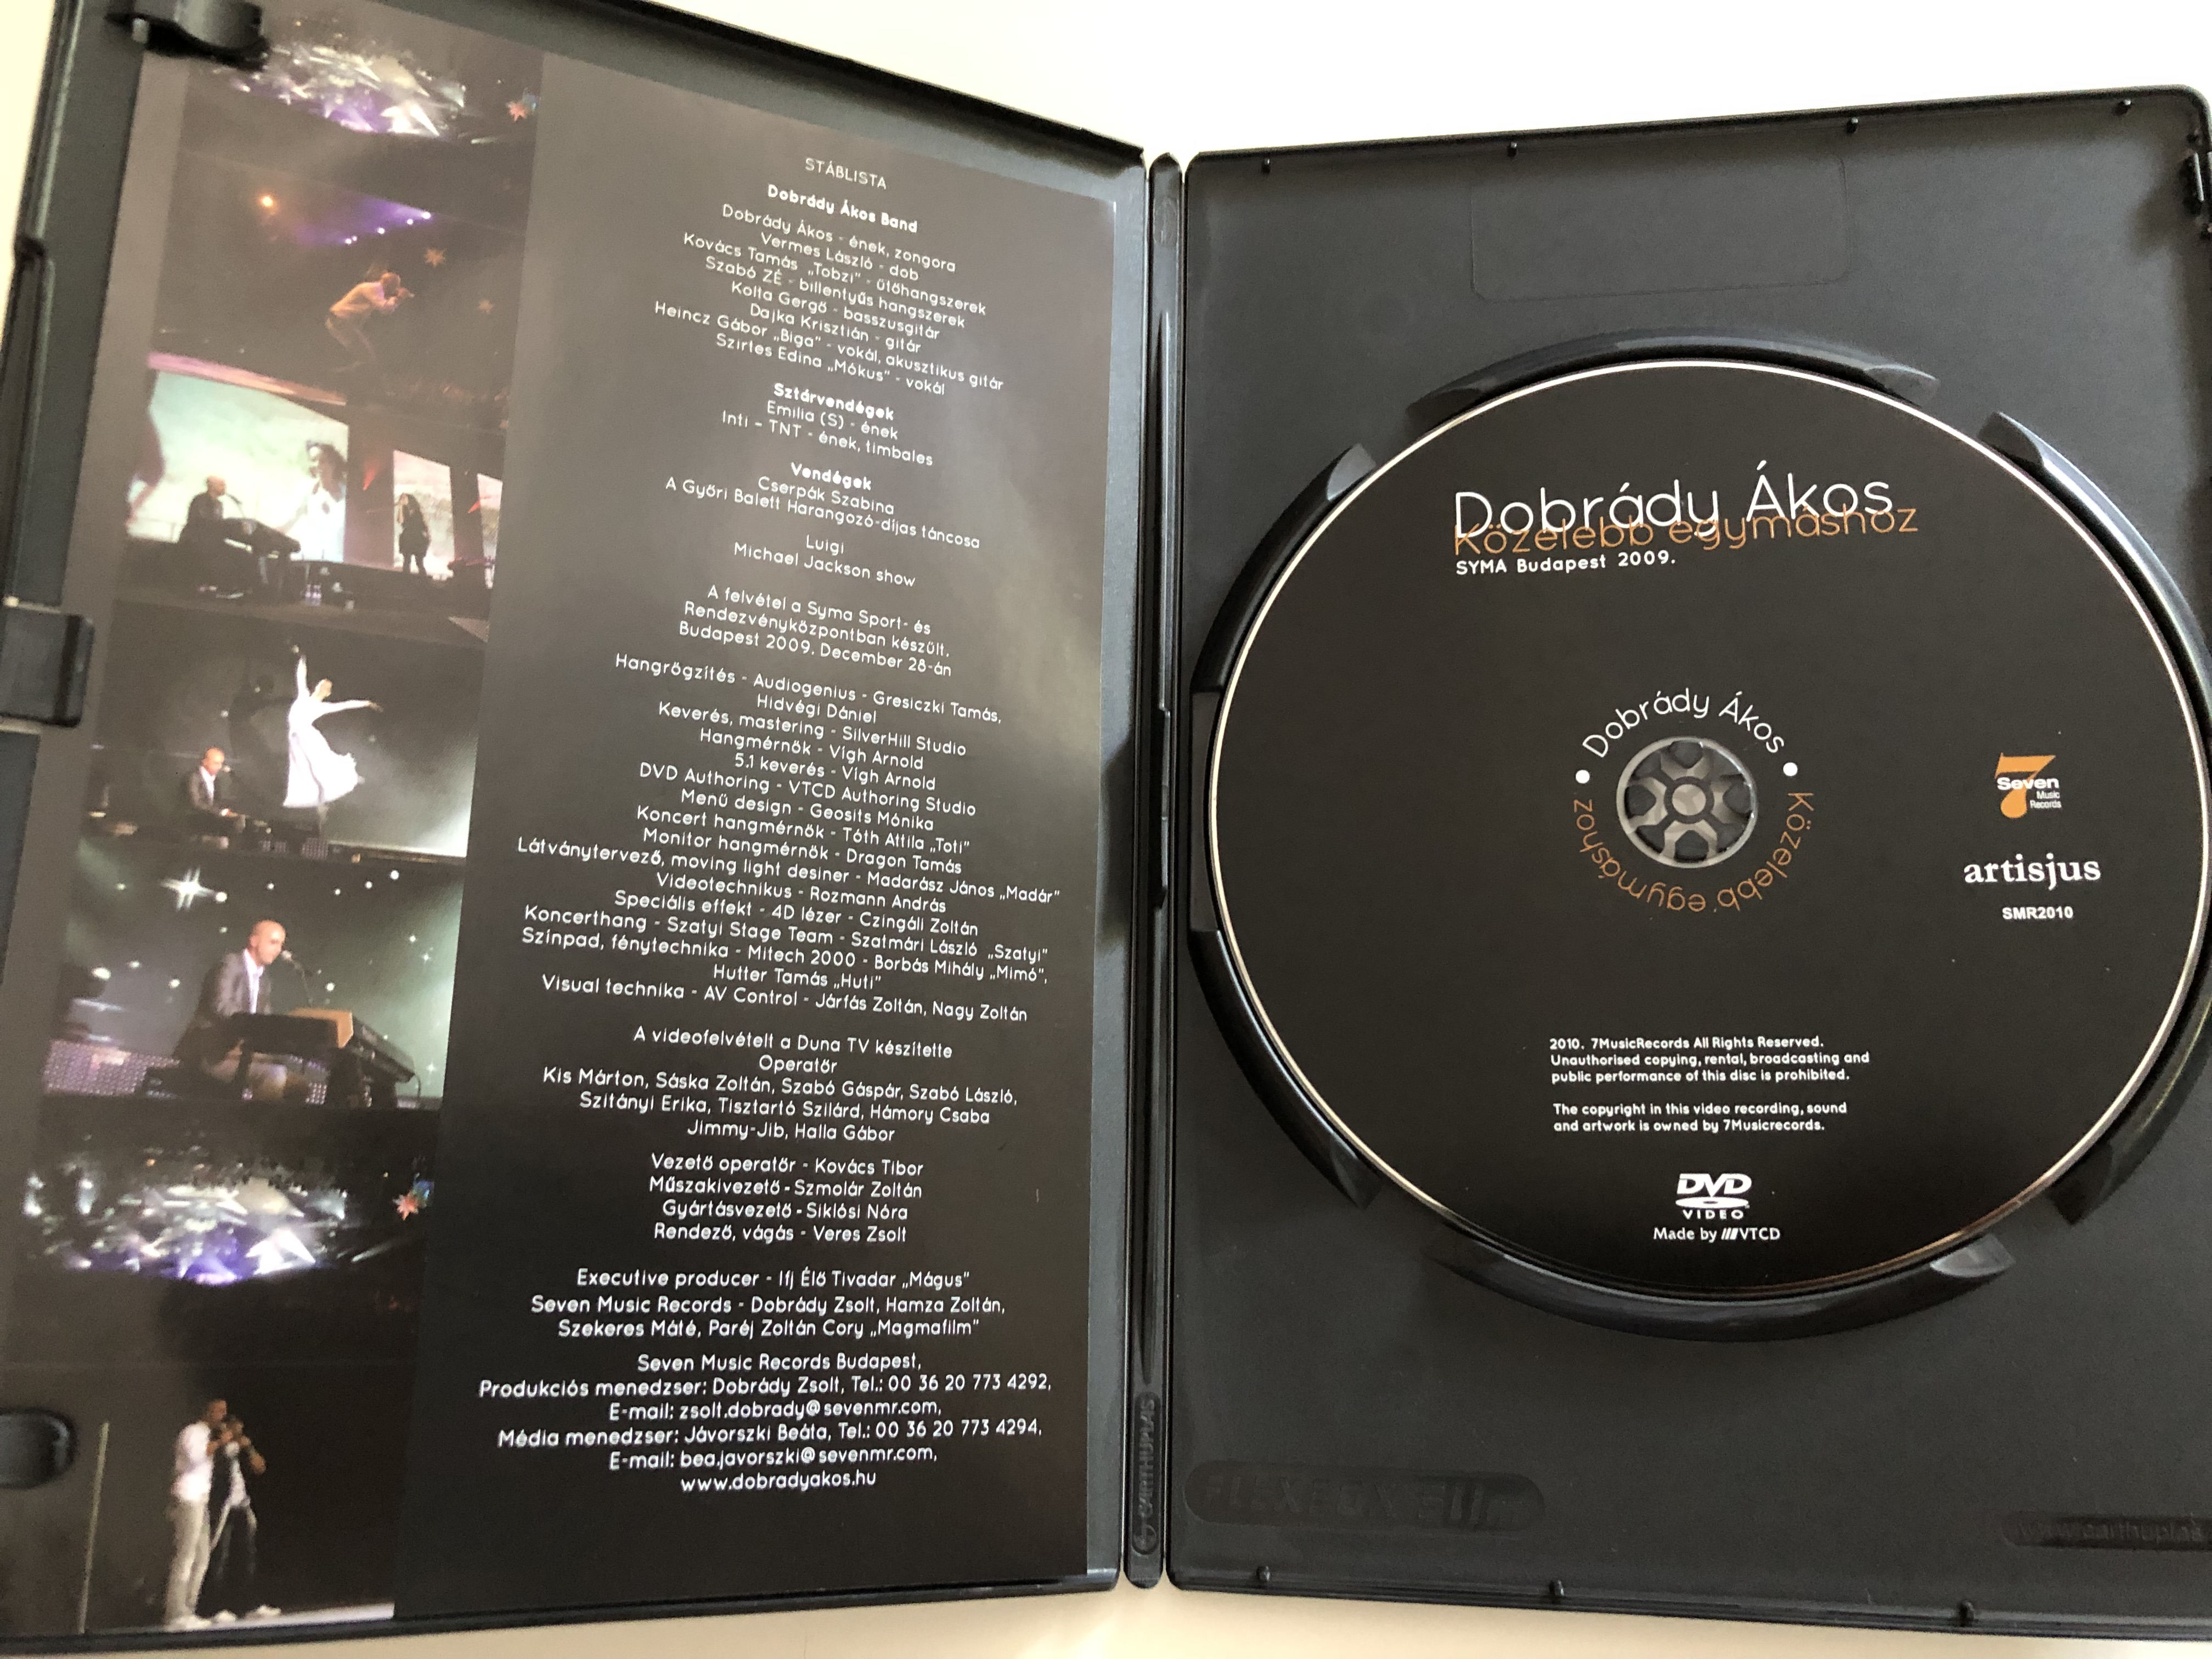 dobr-dy-kos-k-zelebb-egym-shoz-dvd-2010-directed-by-veres-zsolt-2009-live-concert-recording-smr-2010-musicdome-2-.jpg